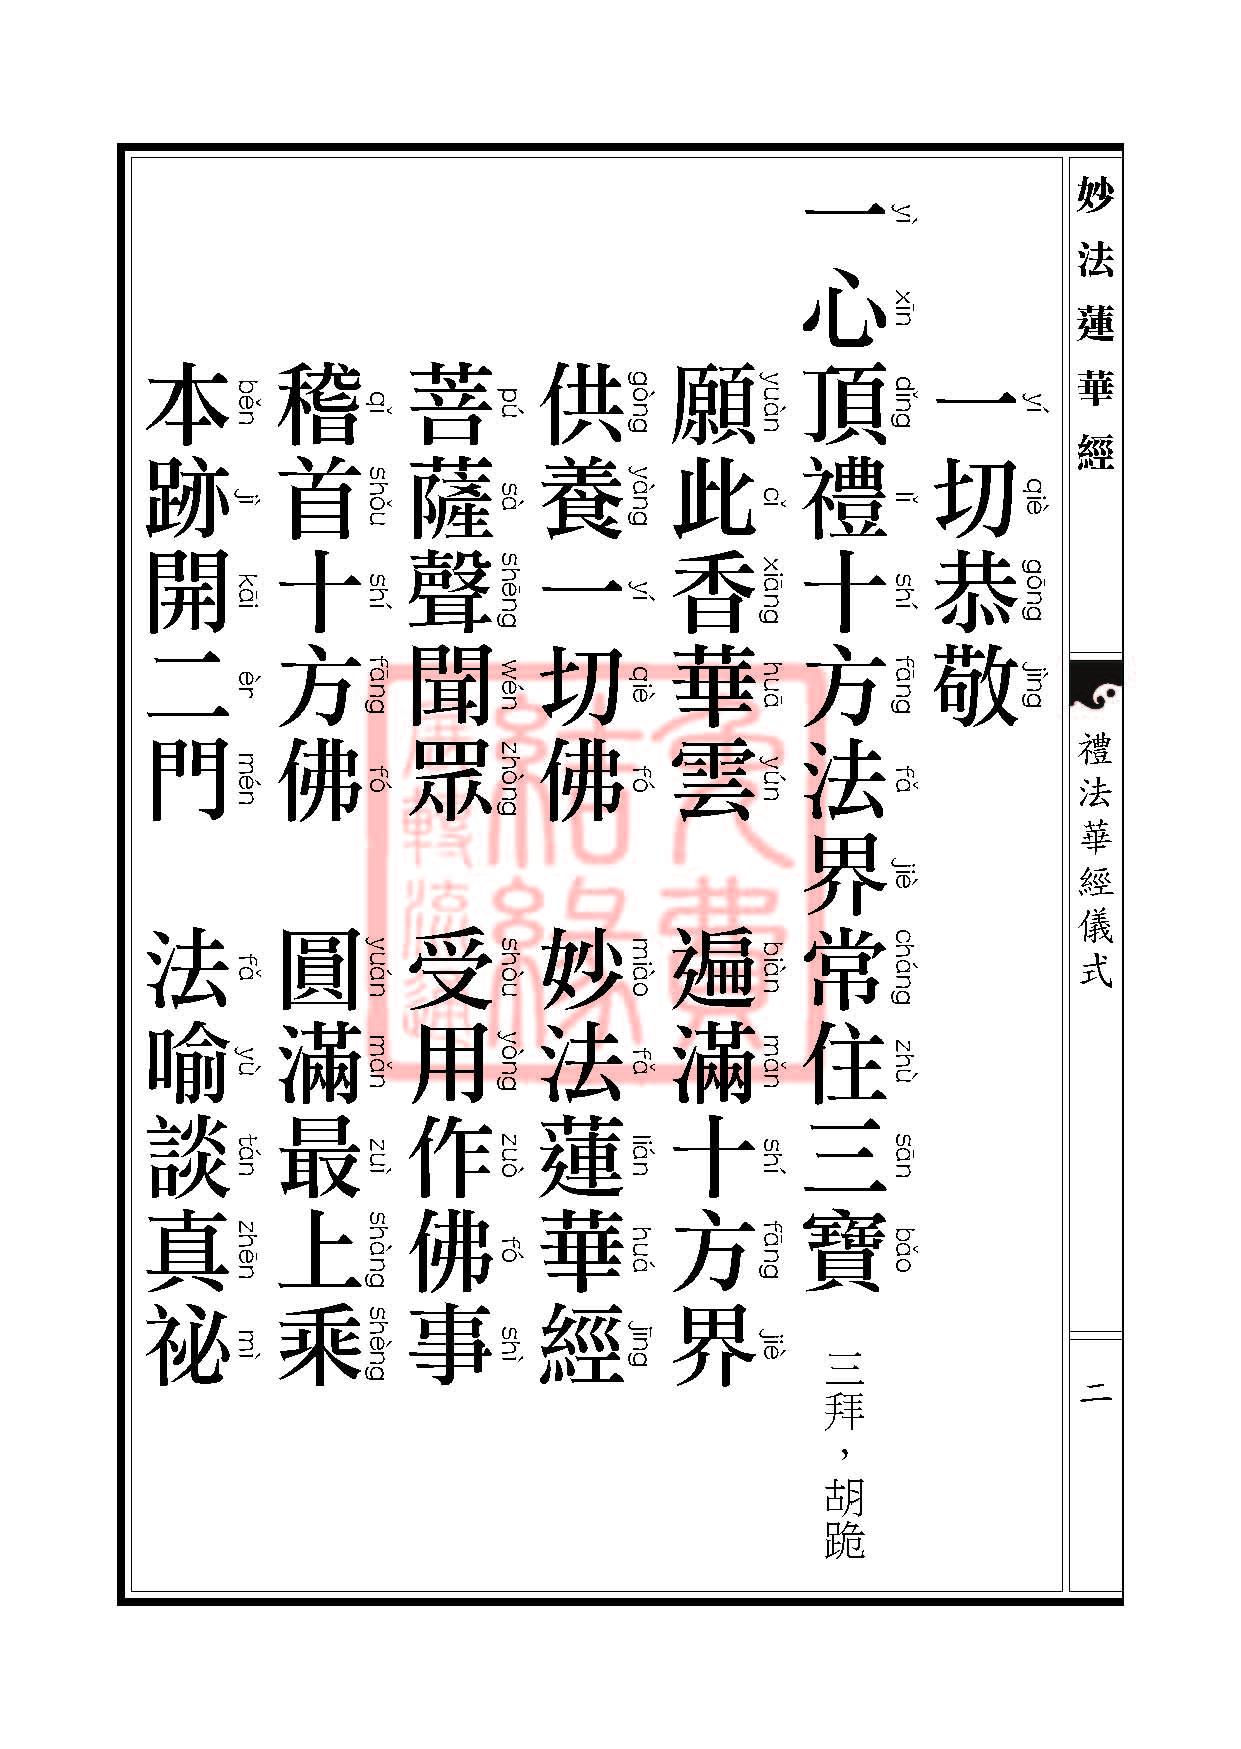 Book_FHJ_HK-A6-PY_Web_页面_002.jpg